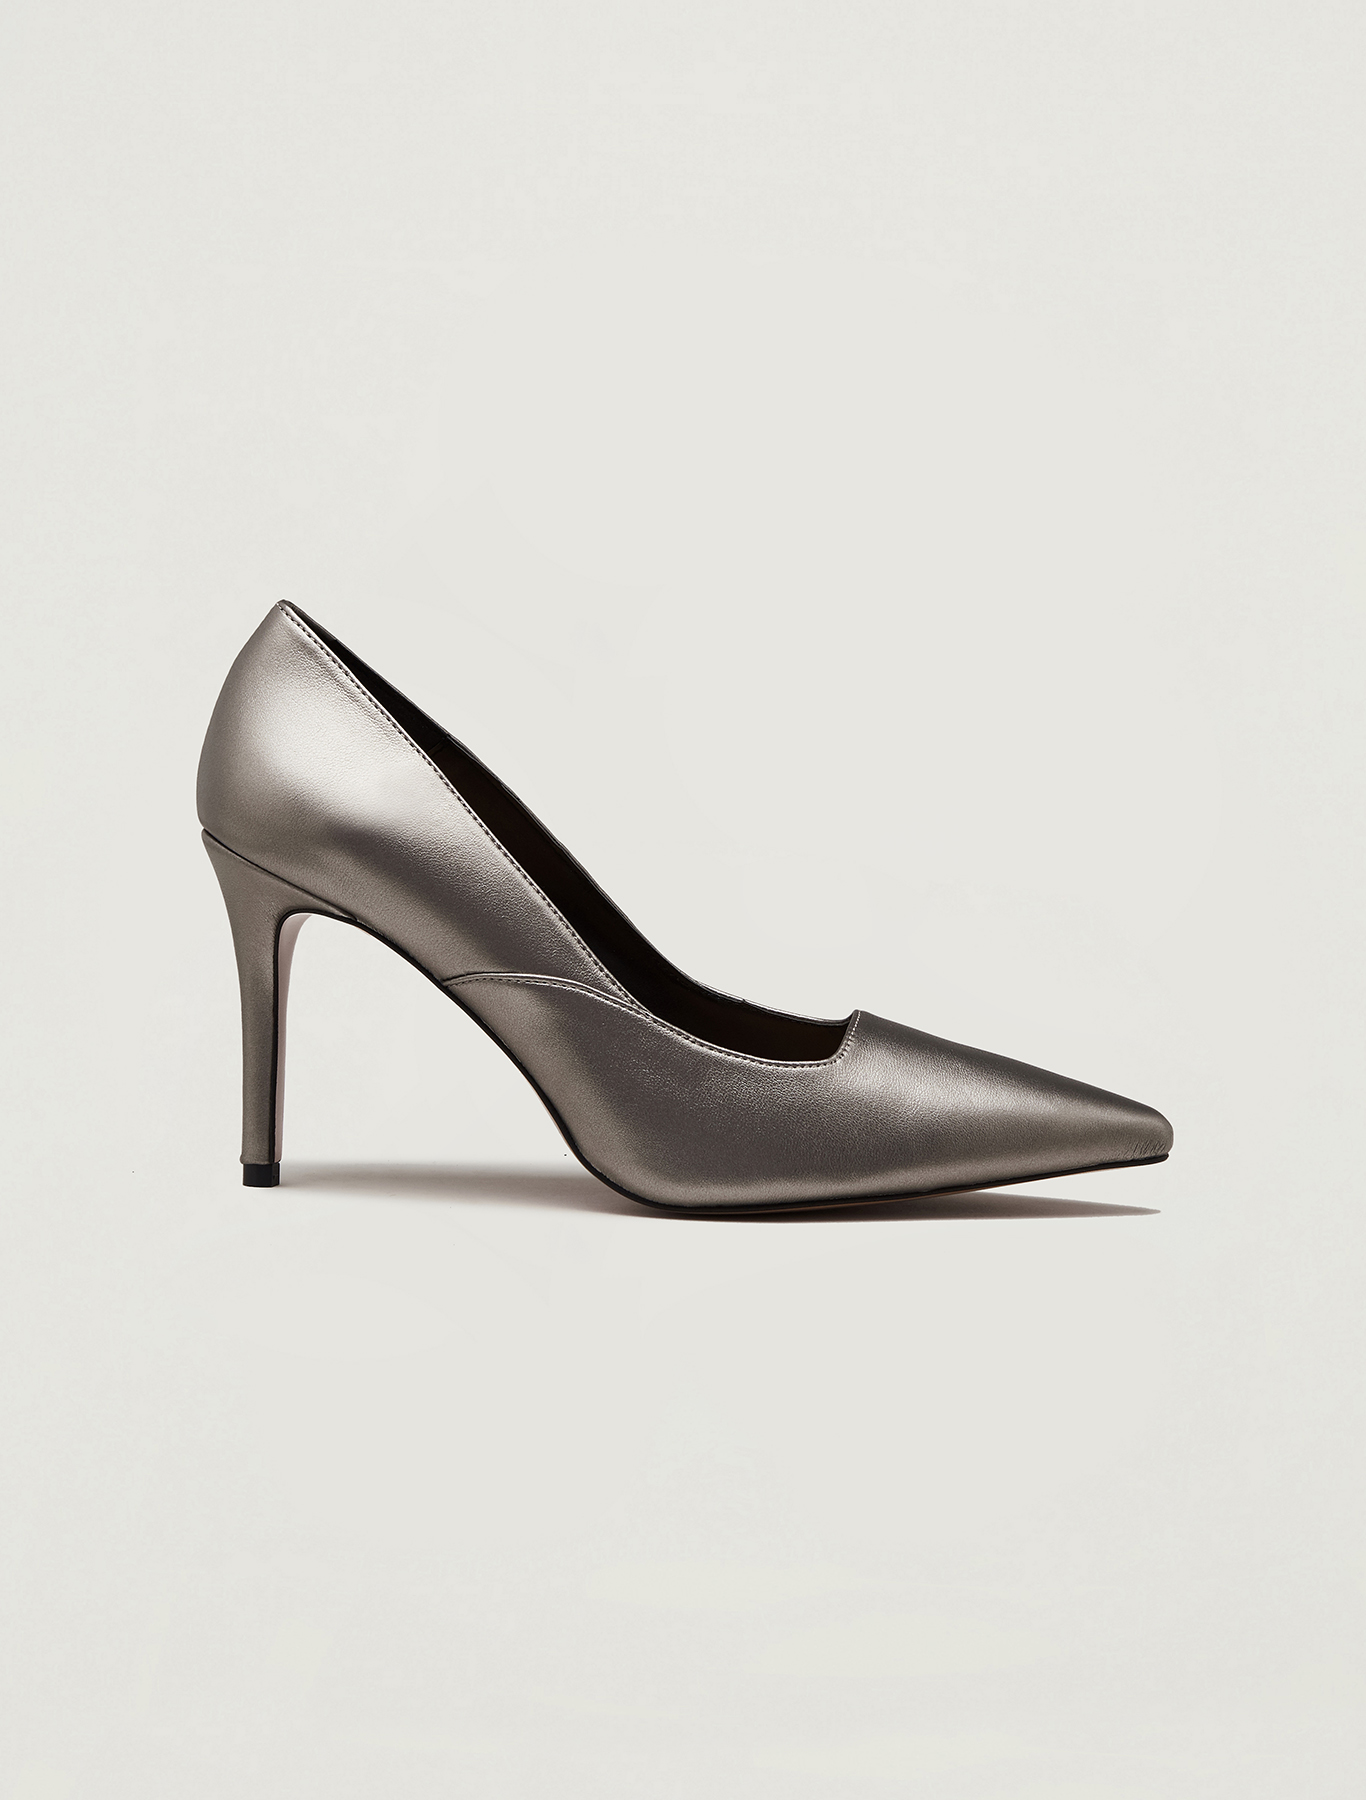 Metallic court shoes - dark grey - pennyblack